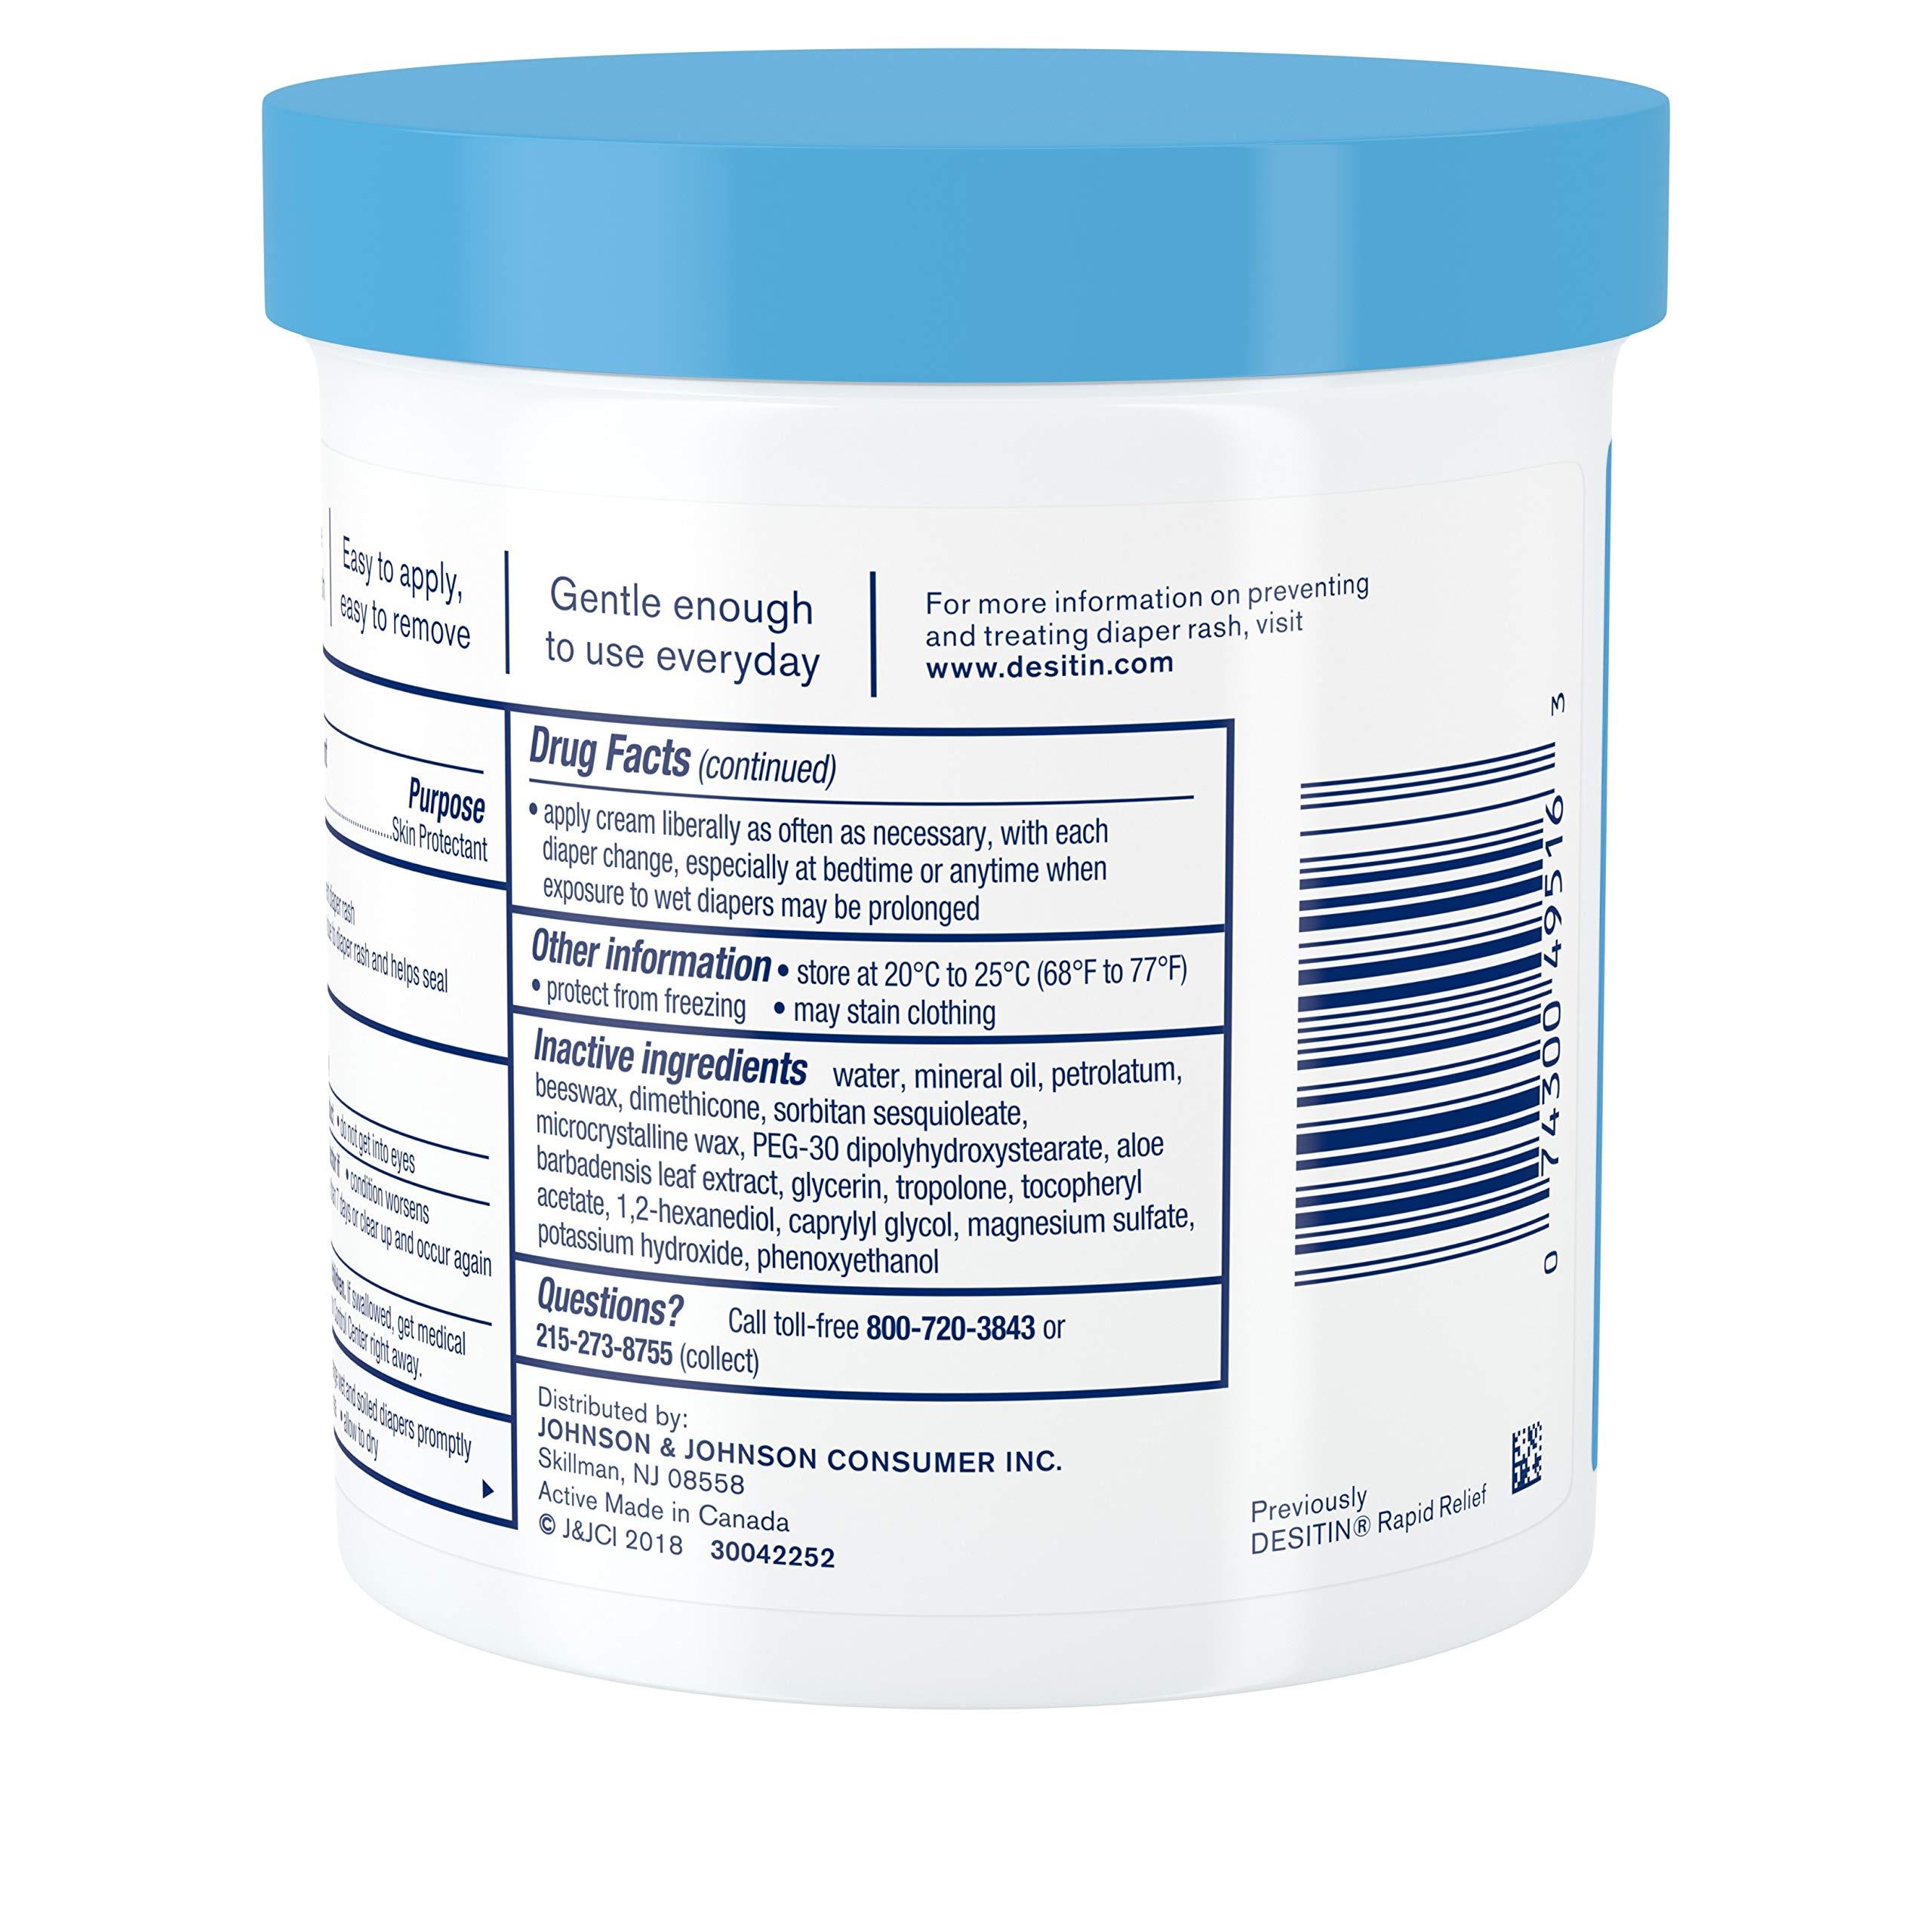 Desitin Daily Defense Baby Diaper Rash Cream with Zinc Oxide to Treat, Relieve & Prevent diaper rash, 16 oz by Desitin (Image #8)